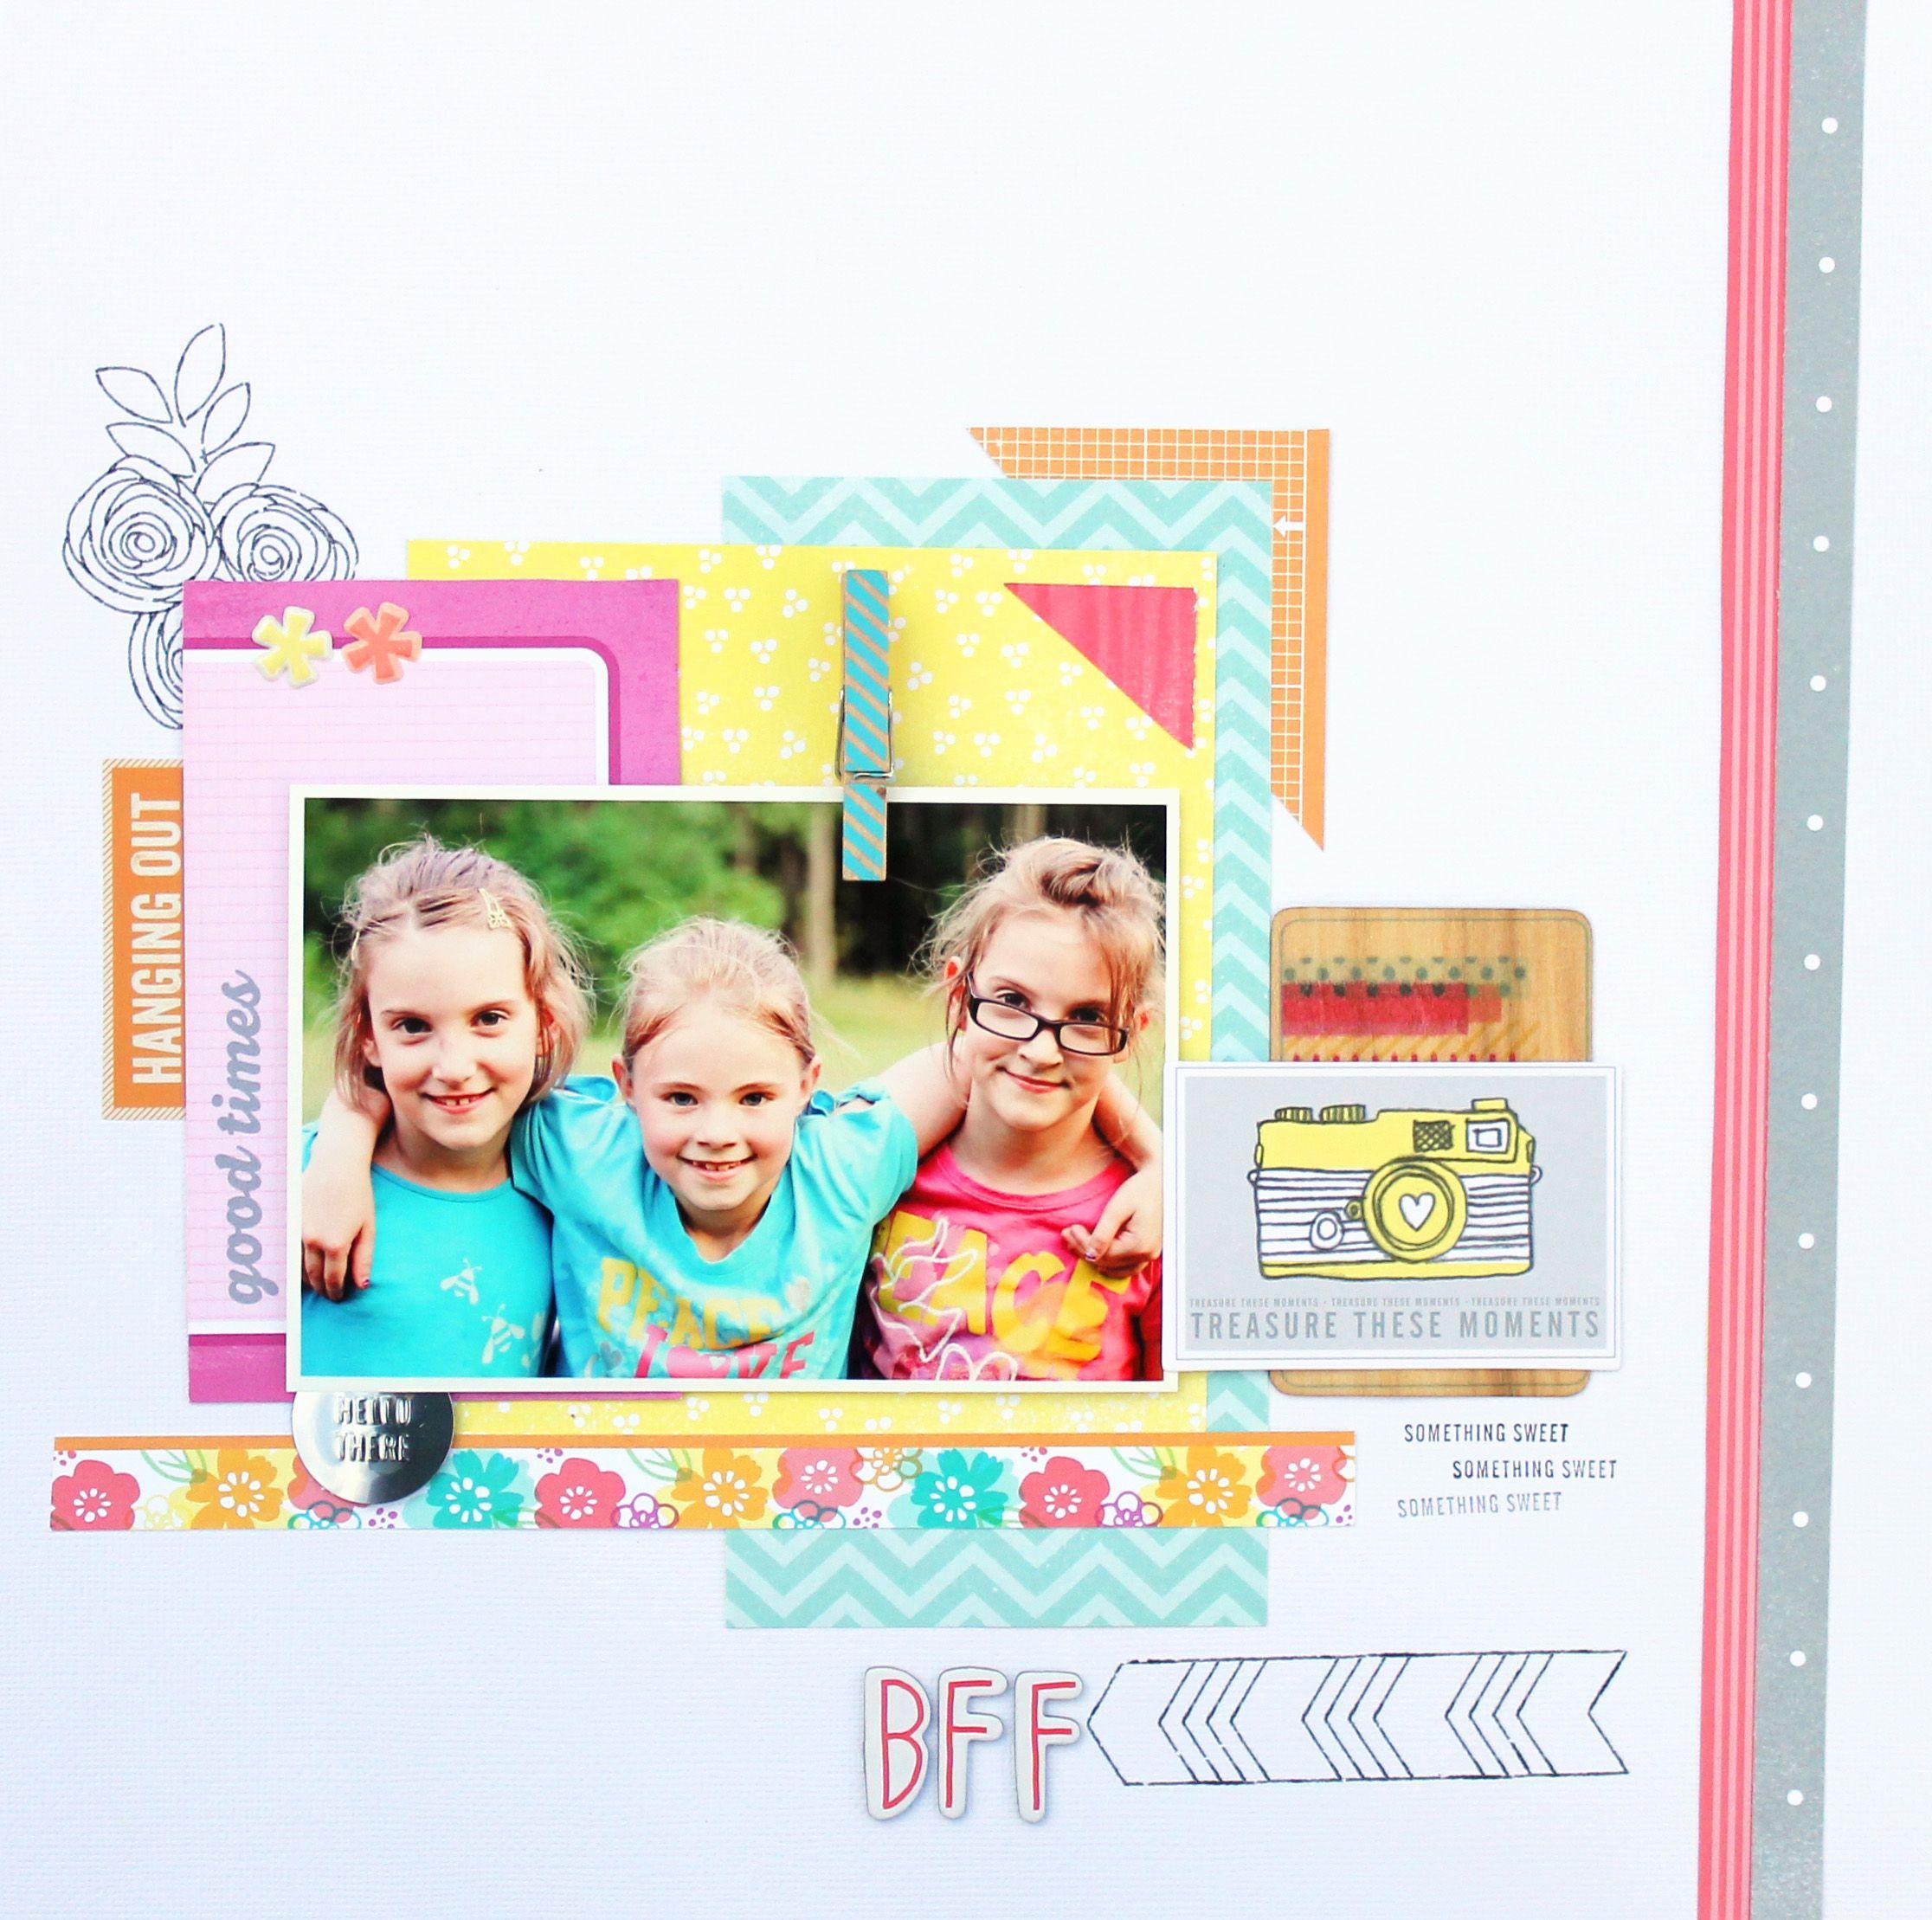 Family scrapbook ideas on pinterest - Bff Scrapbook Com